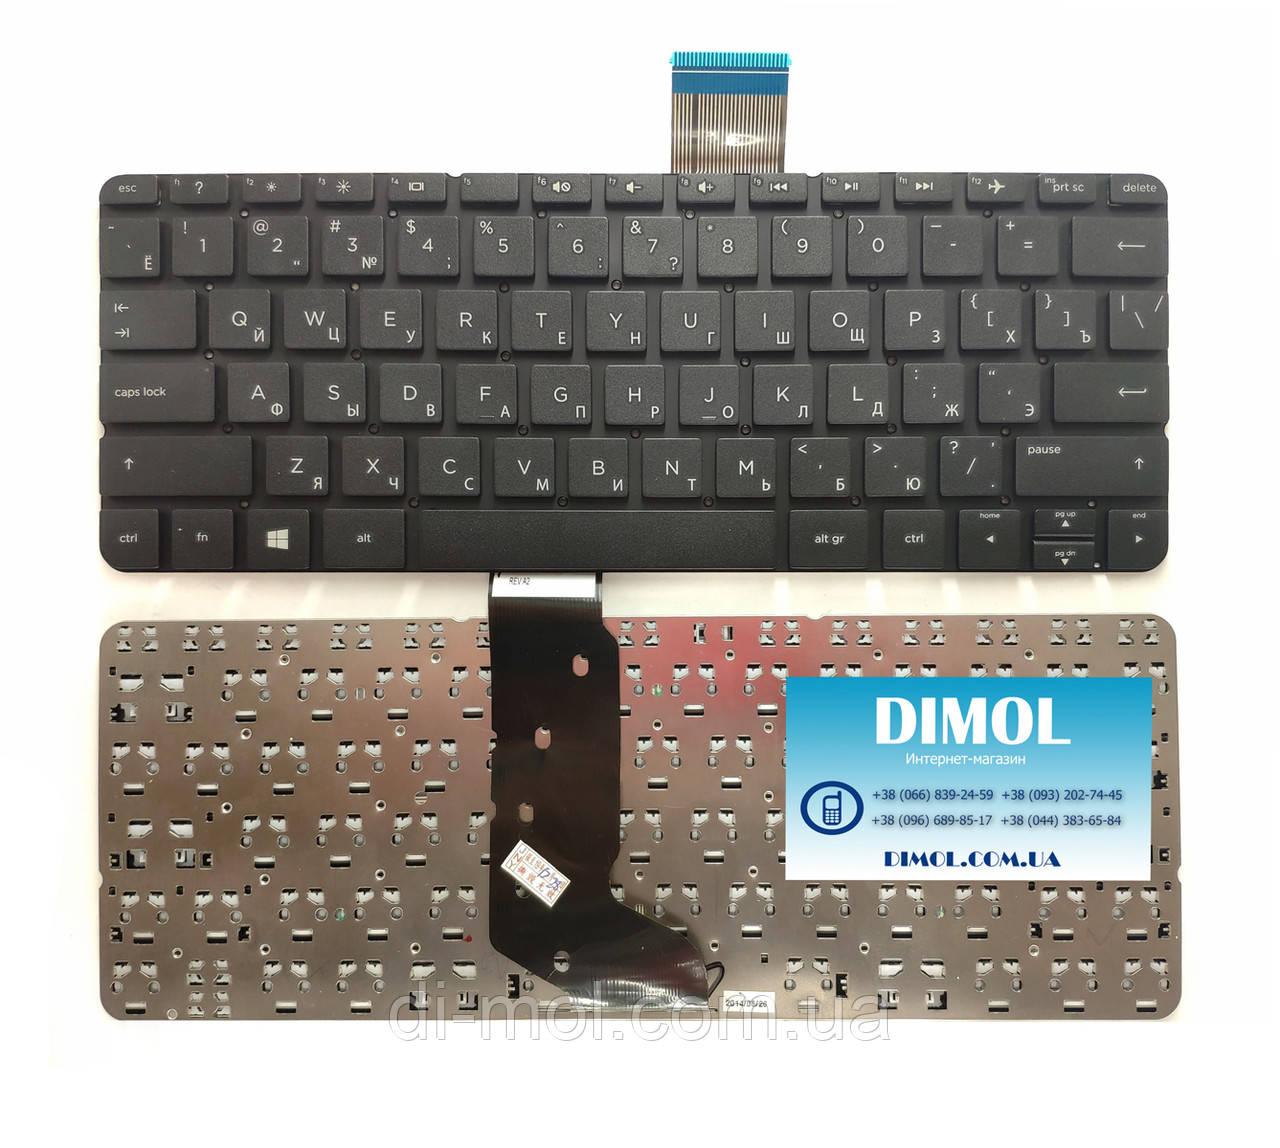 Оригинальная клавиатура для ноутбука HP Pavilion x360 11-N series, black, ru